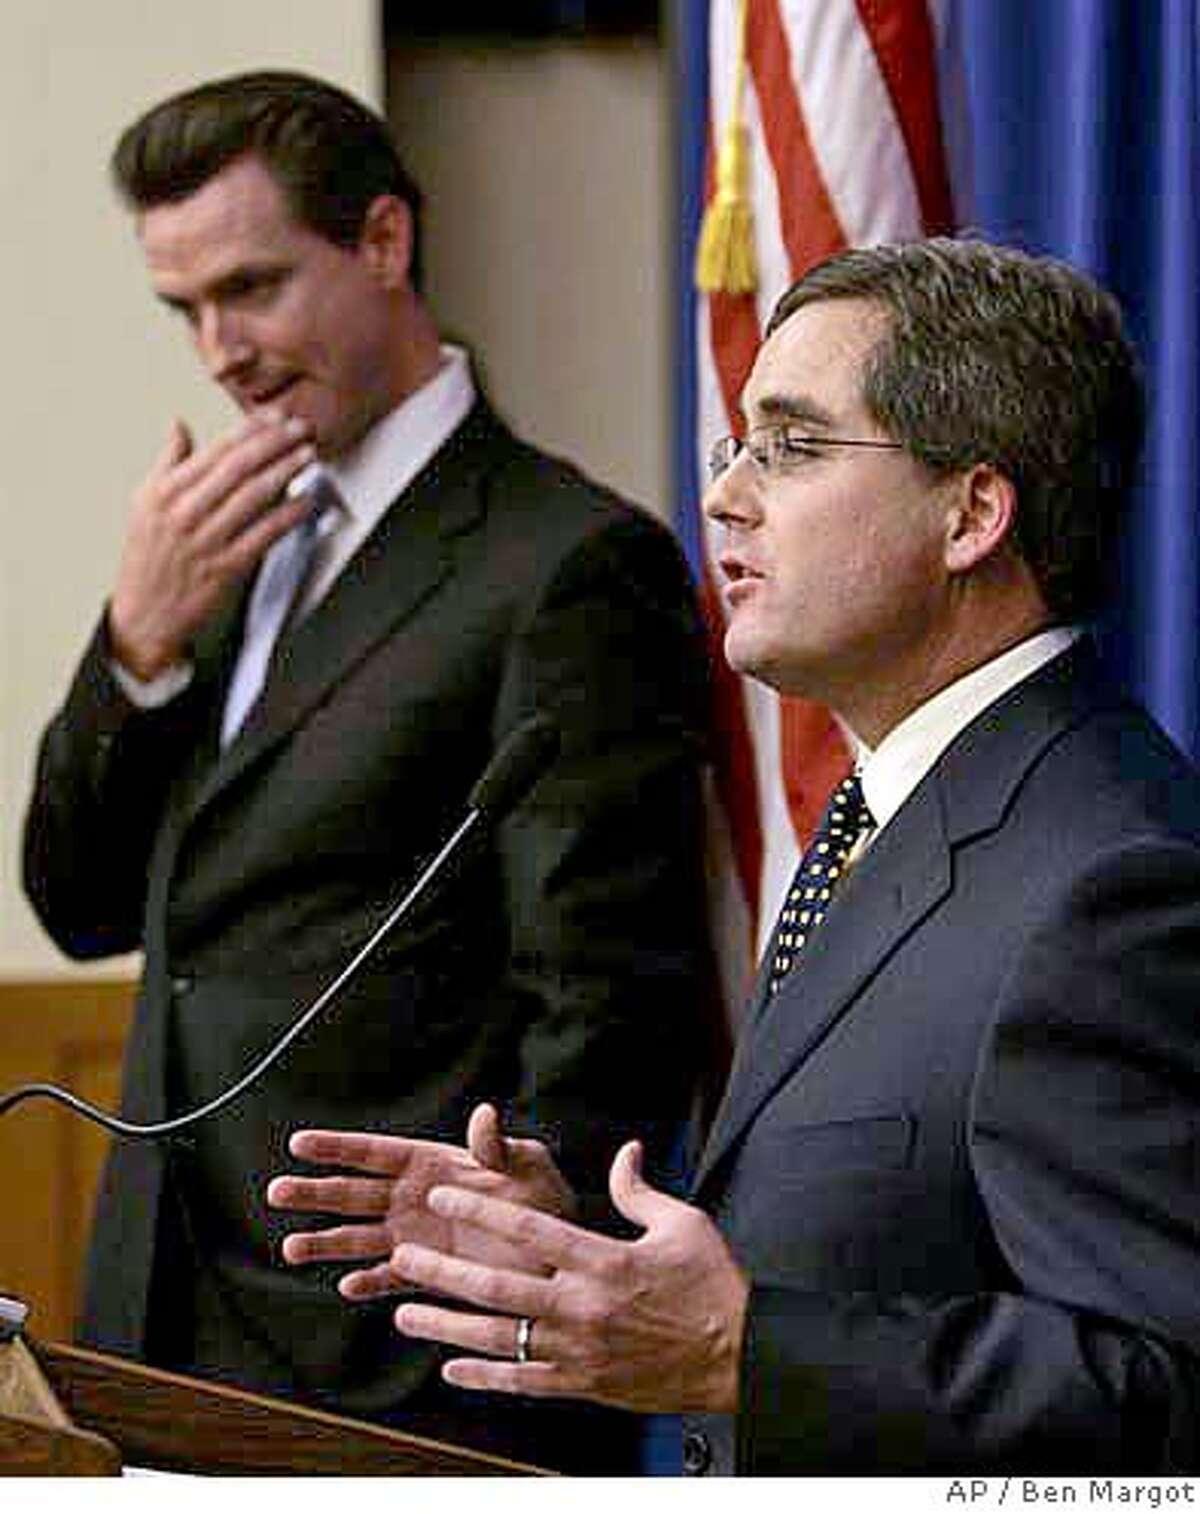 San Francisco City Attorney Dennis Herrera, right, gestures beside Mayor Gavin Newsom during a media conference Thurday. Associated Press photo by Ben Margot